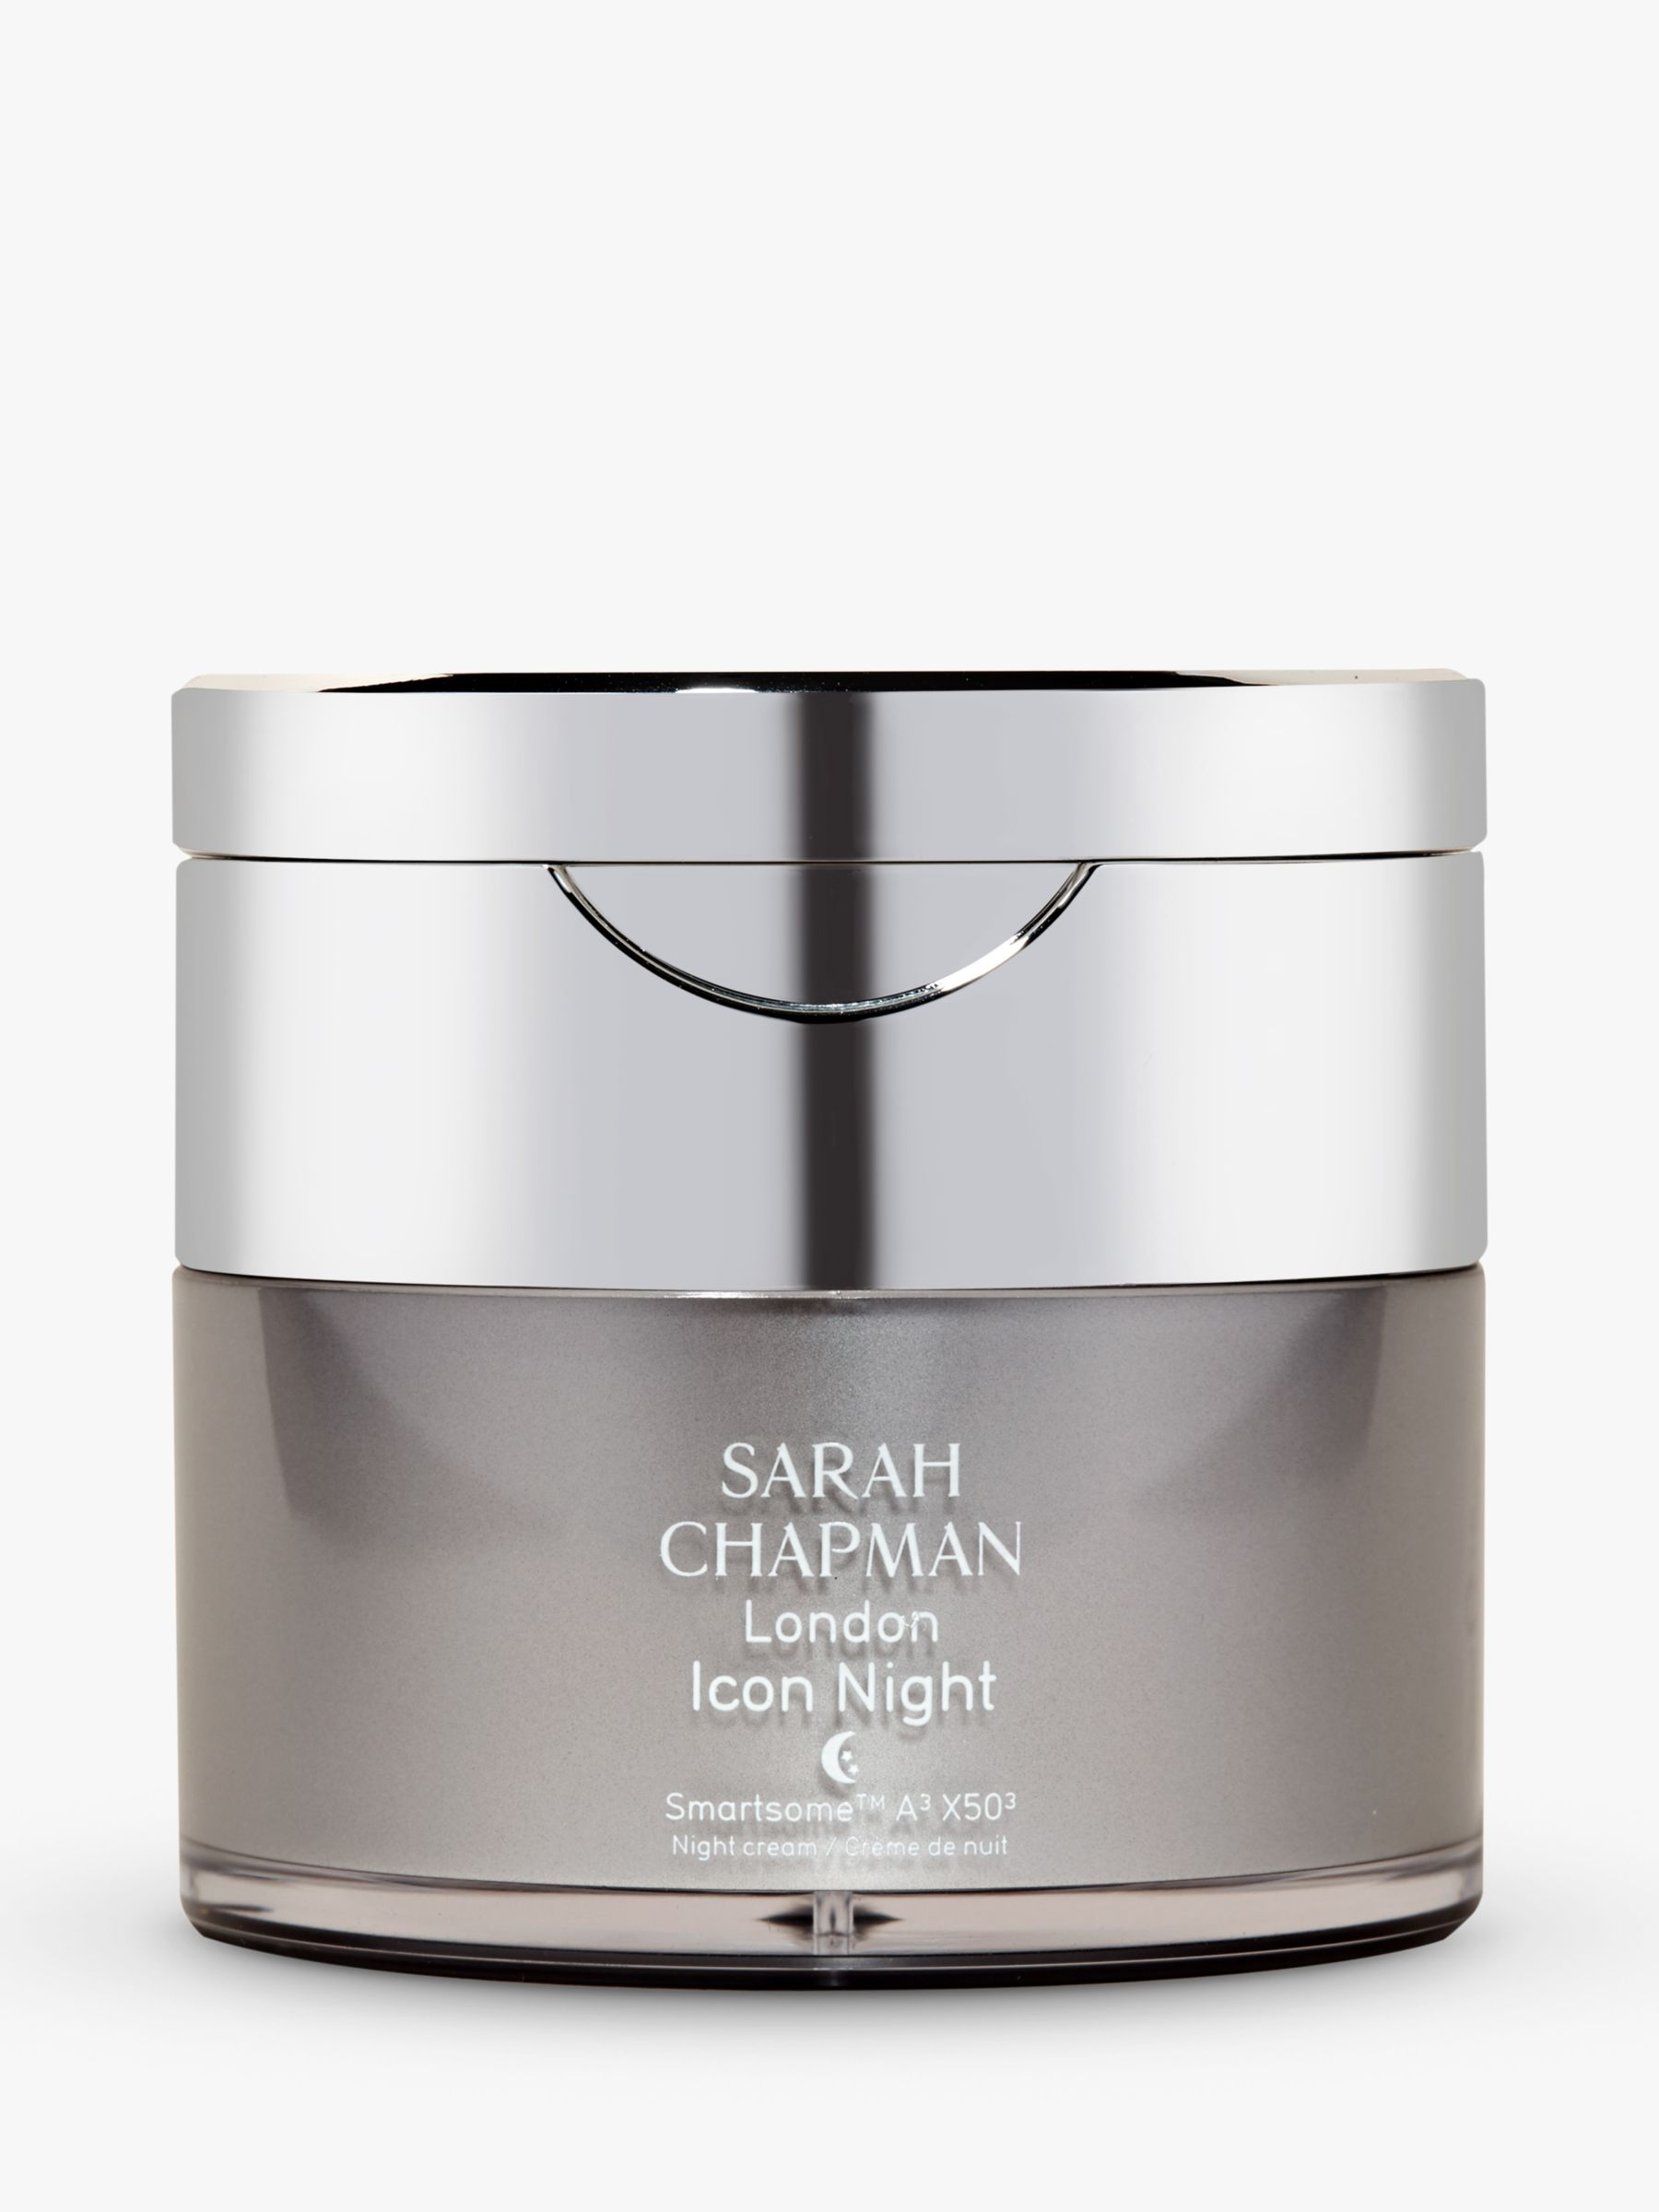 Sarah Chapman Sarah Chapman Icon Night Smartsome™ Night Cream, 30ml